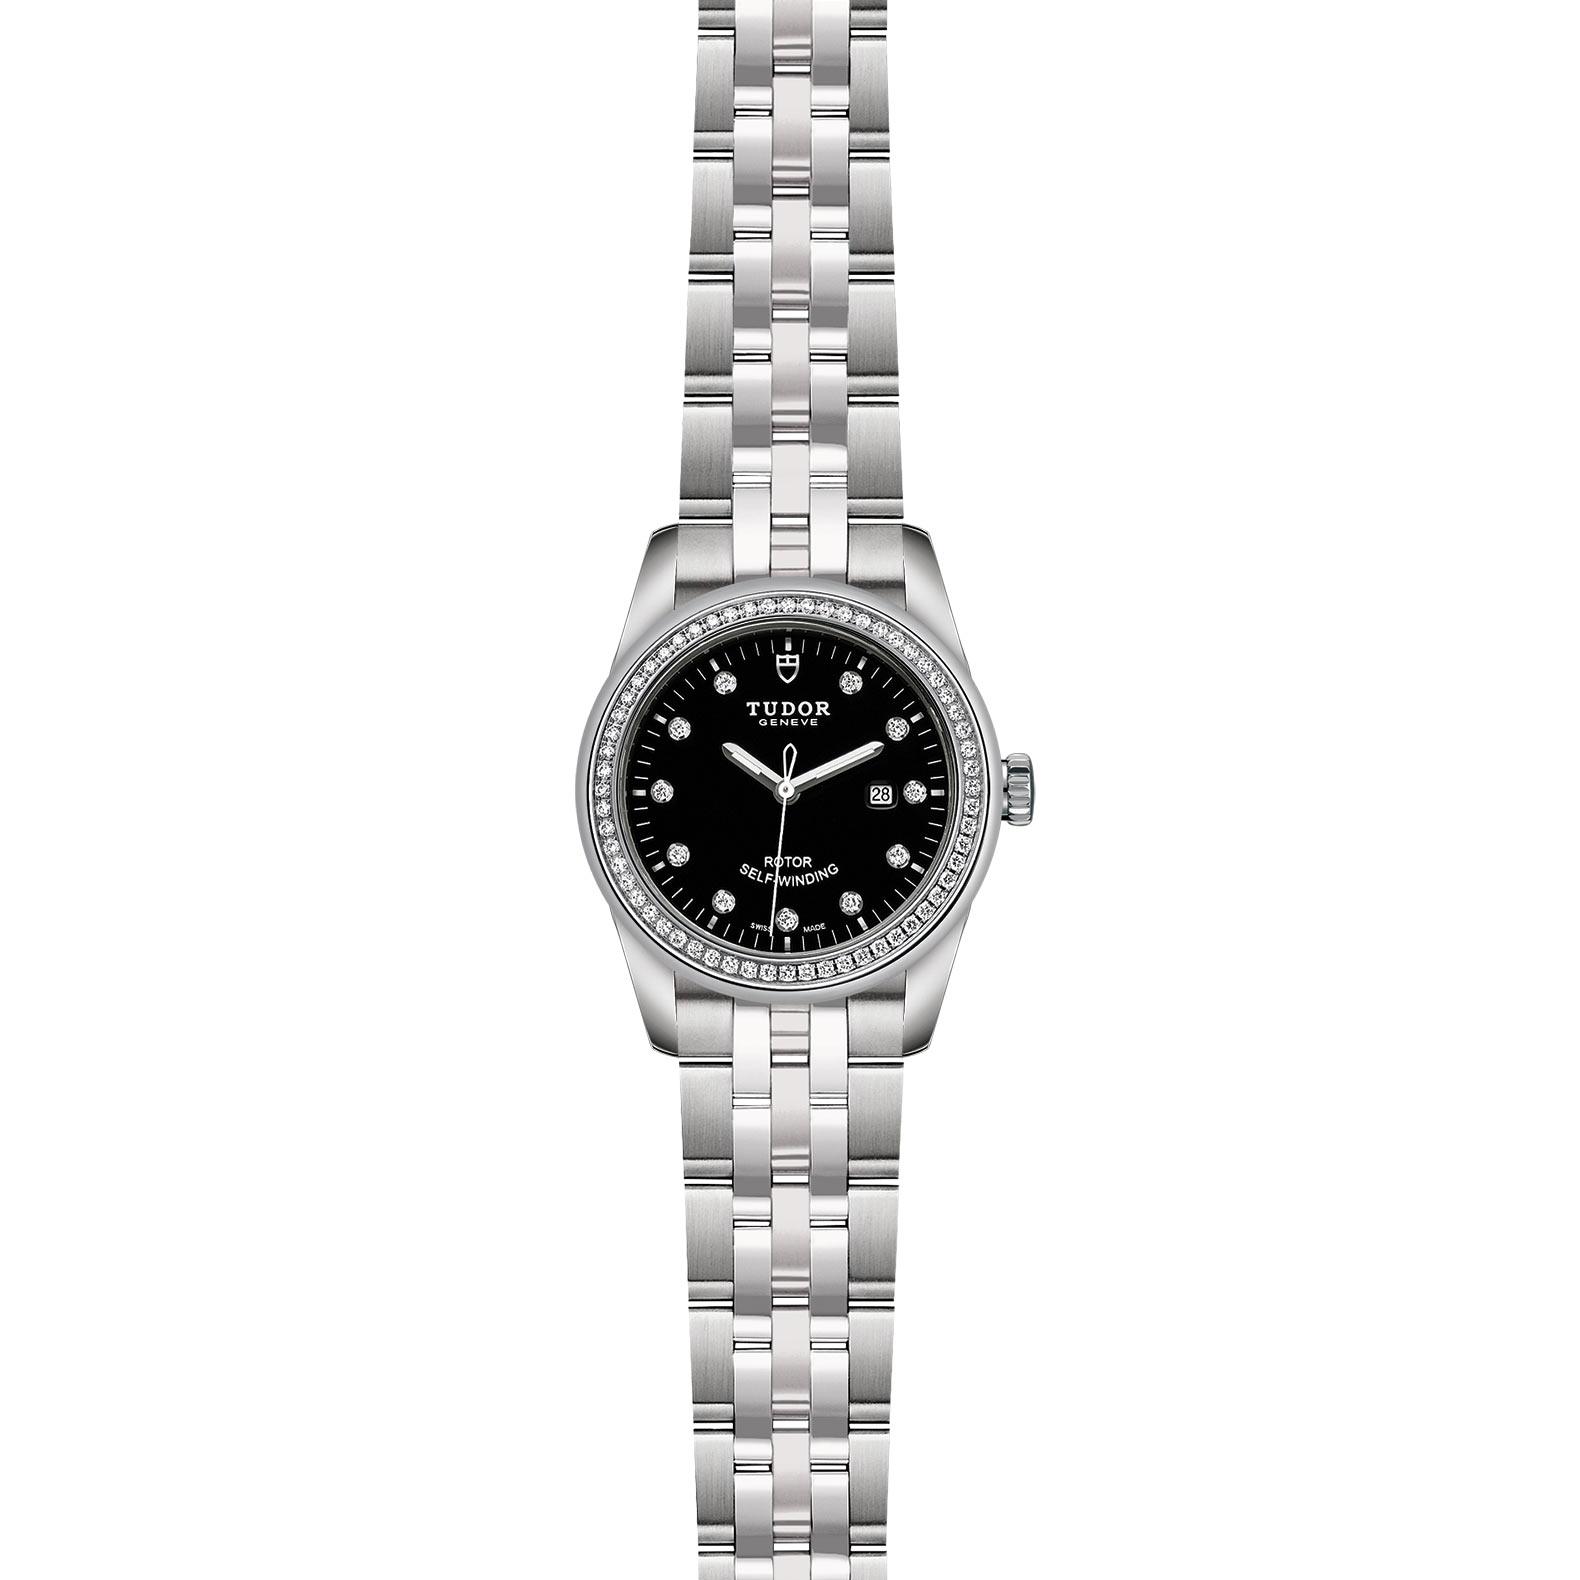 TUDOR Glamour Date M53020 0007 Frontfacing